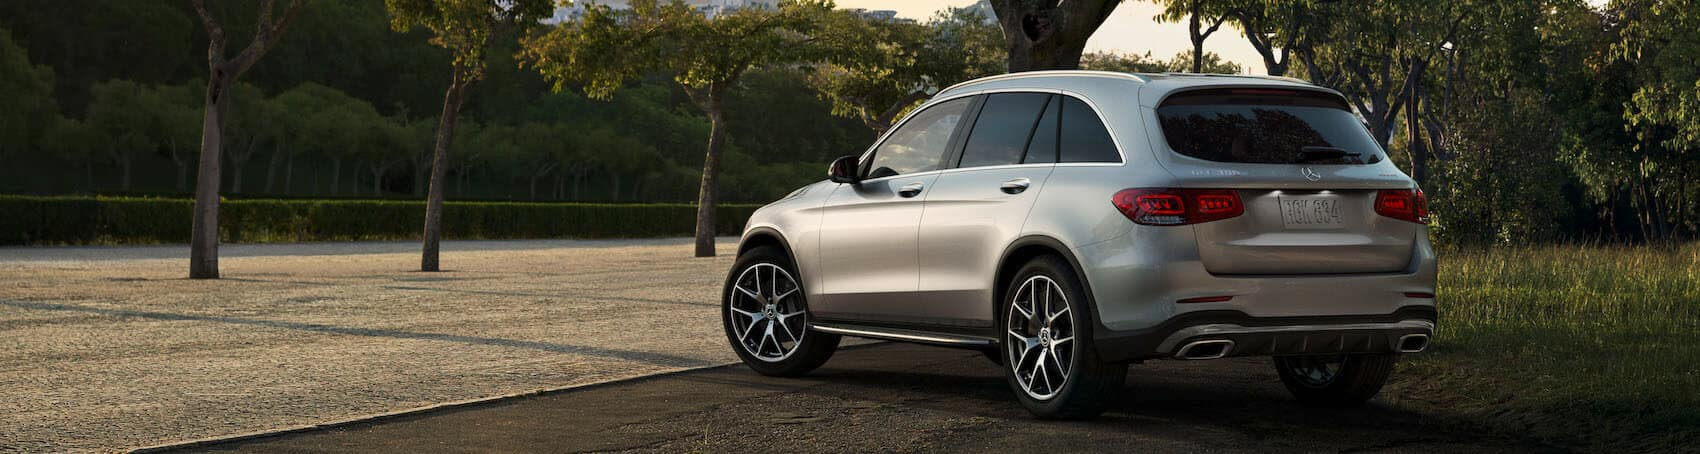 Mercedes-Benz GLC Side